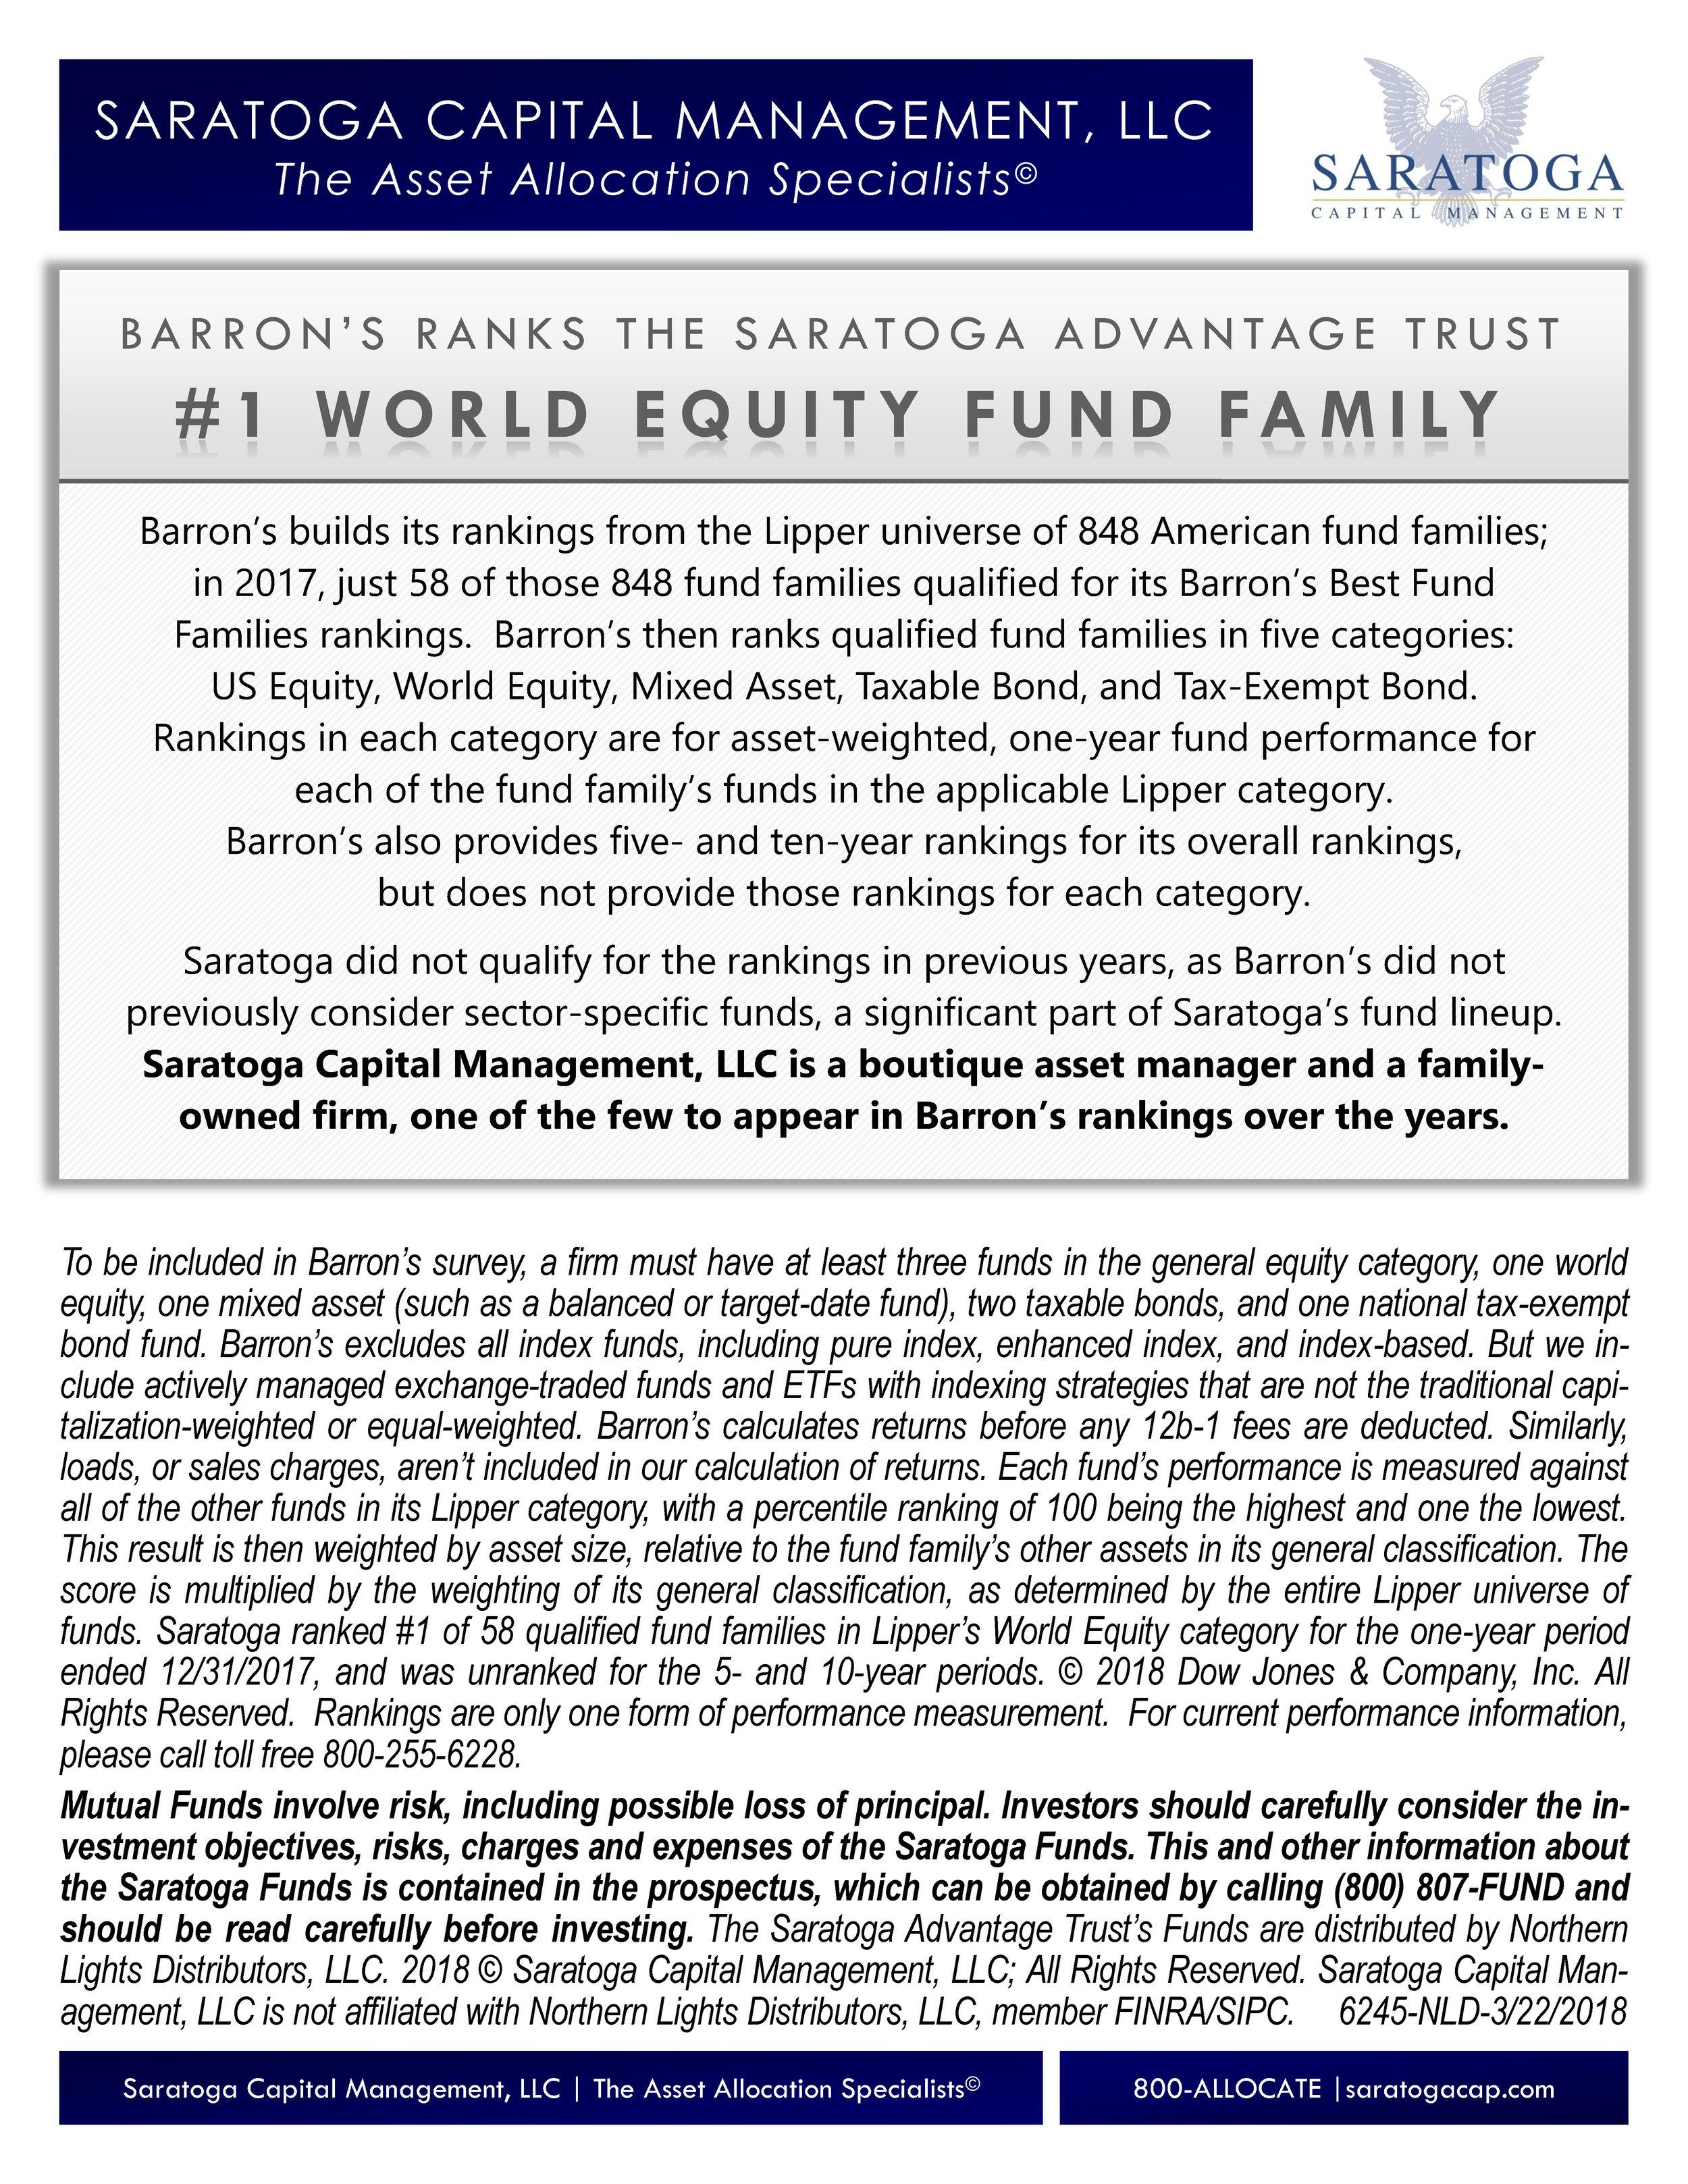 2017-12-31 SAT Barron's Ad.jpg